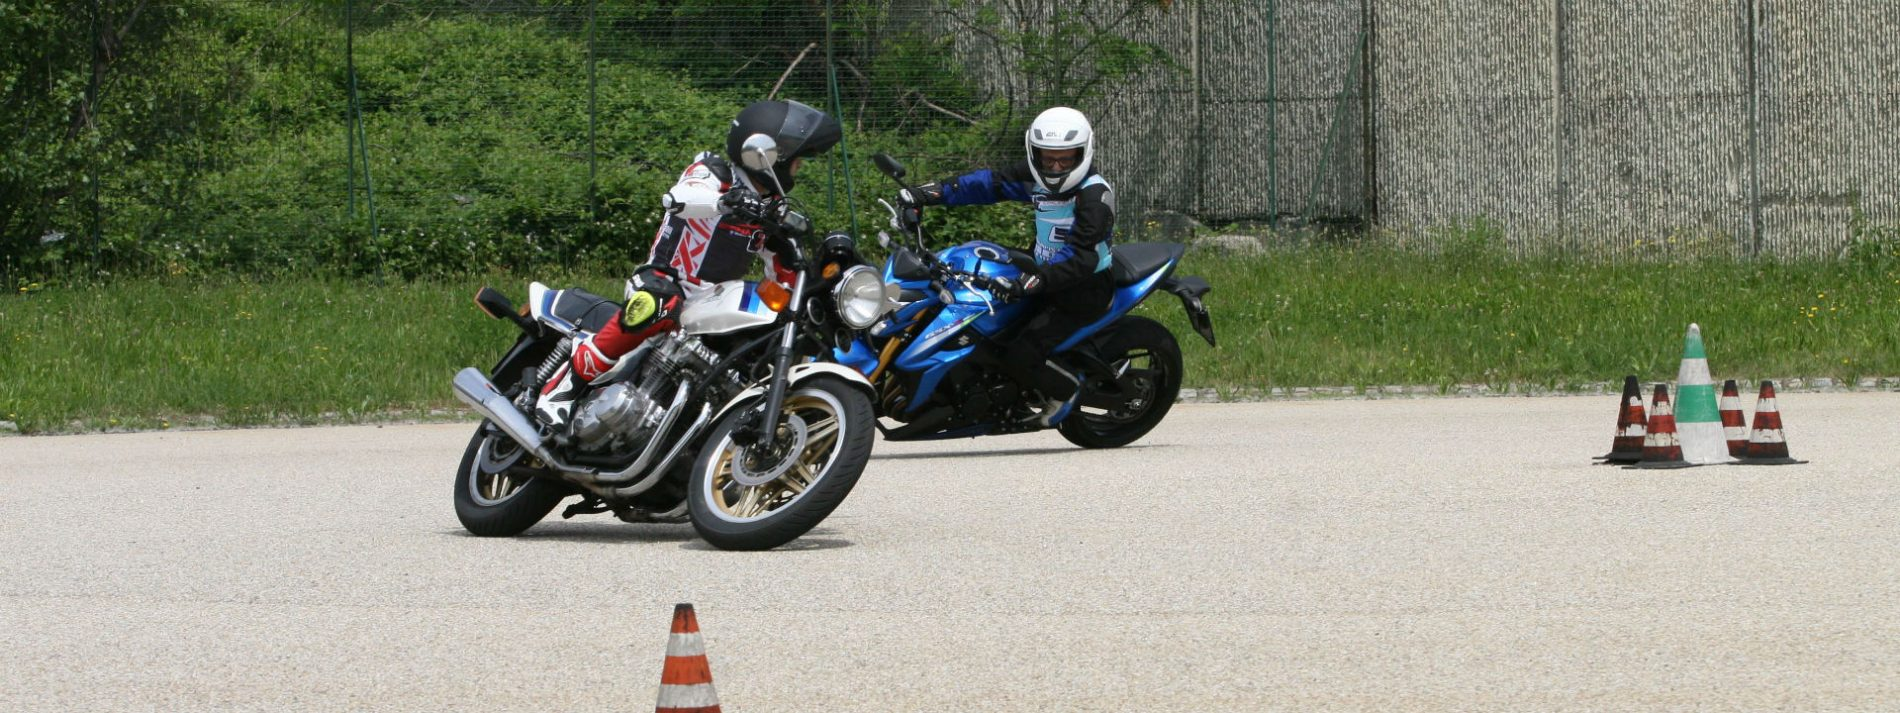 Corso moto